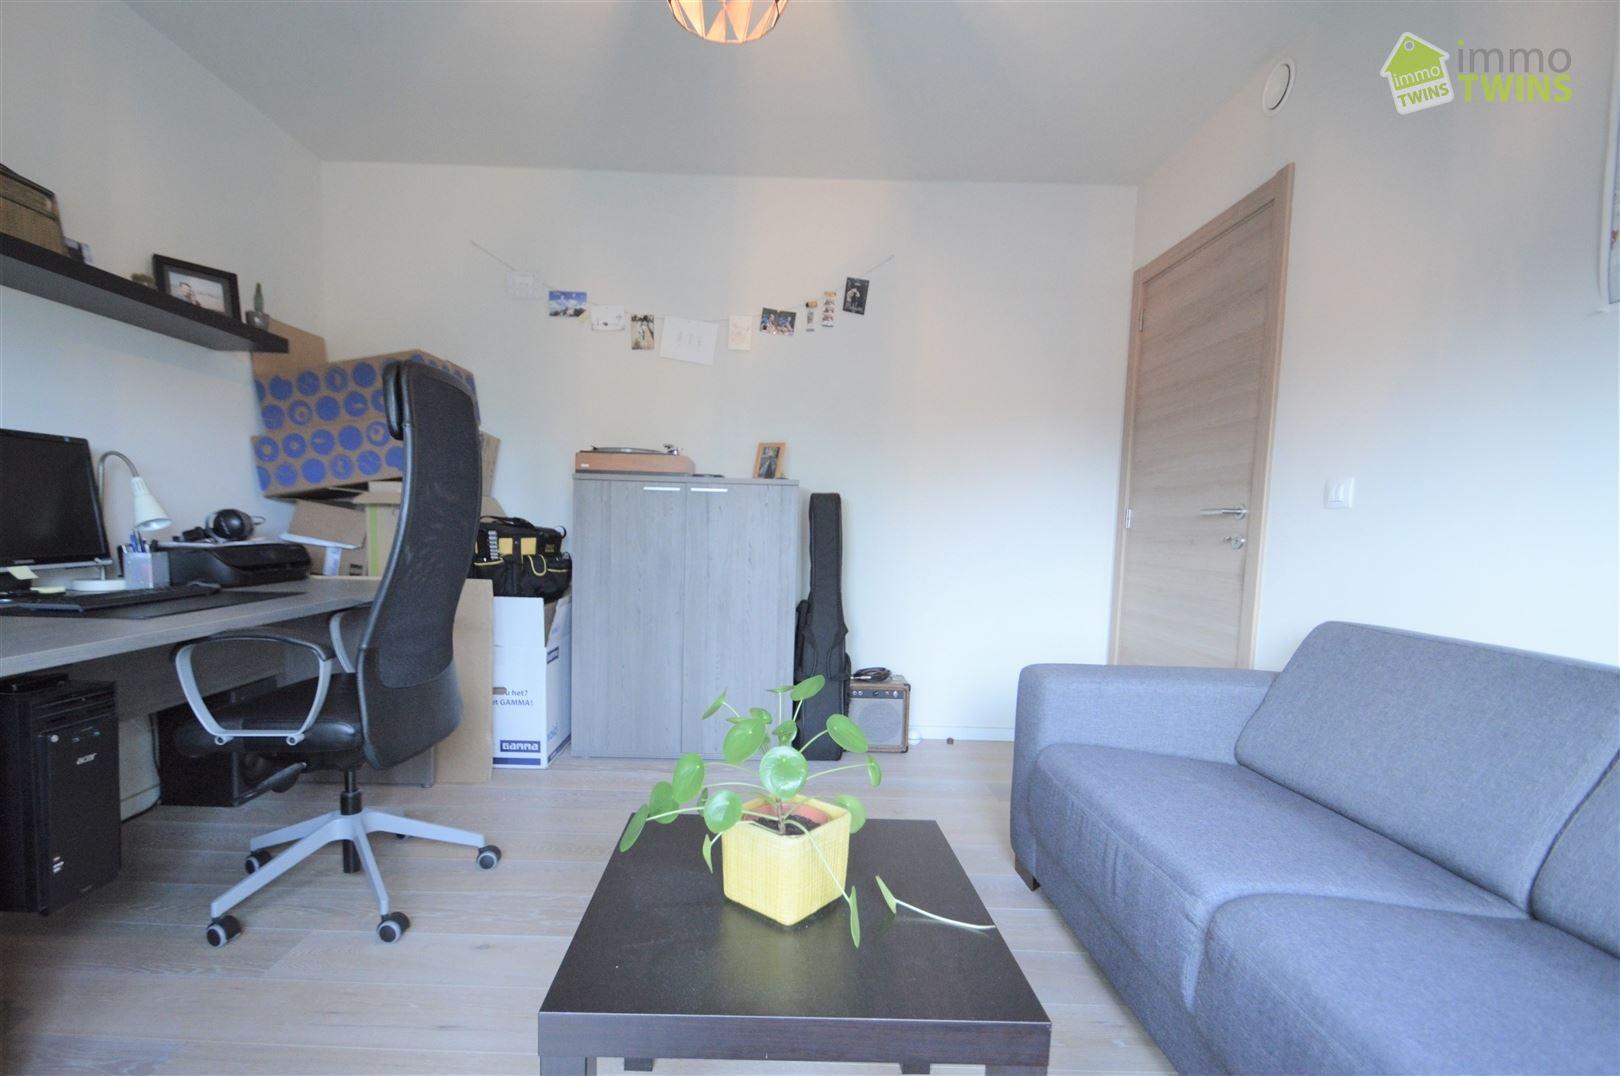 Foto 10 : Appartement te 9200 SINT-GILLIS-DENDERMONDE (België) - Prijs € 835